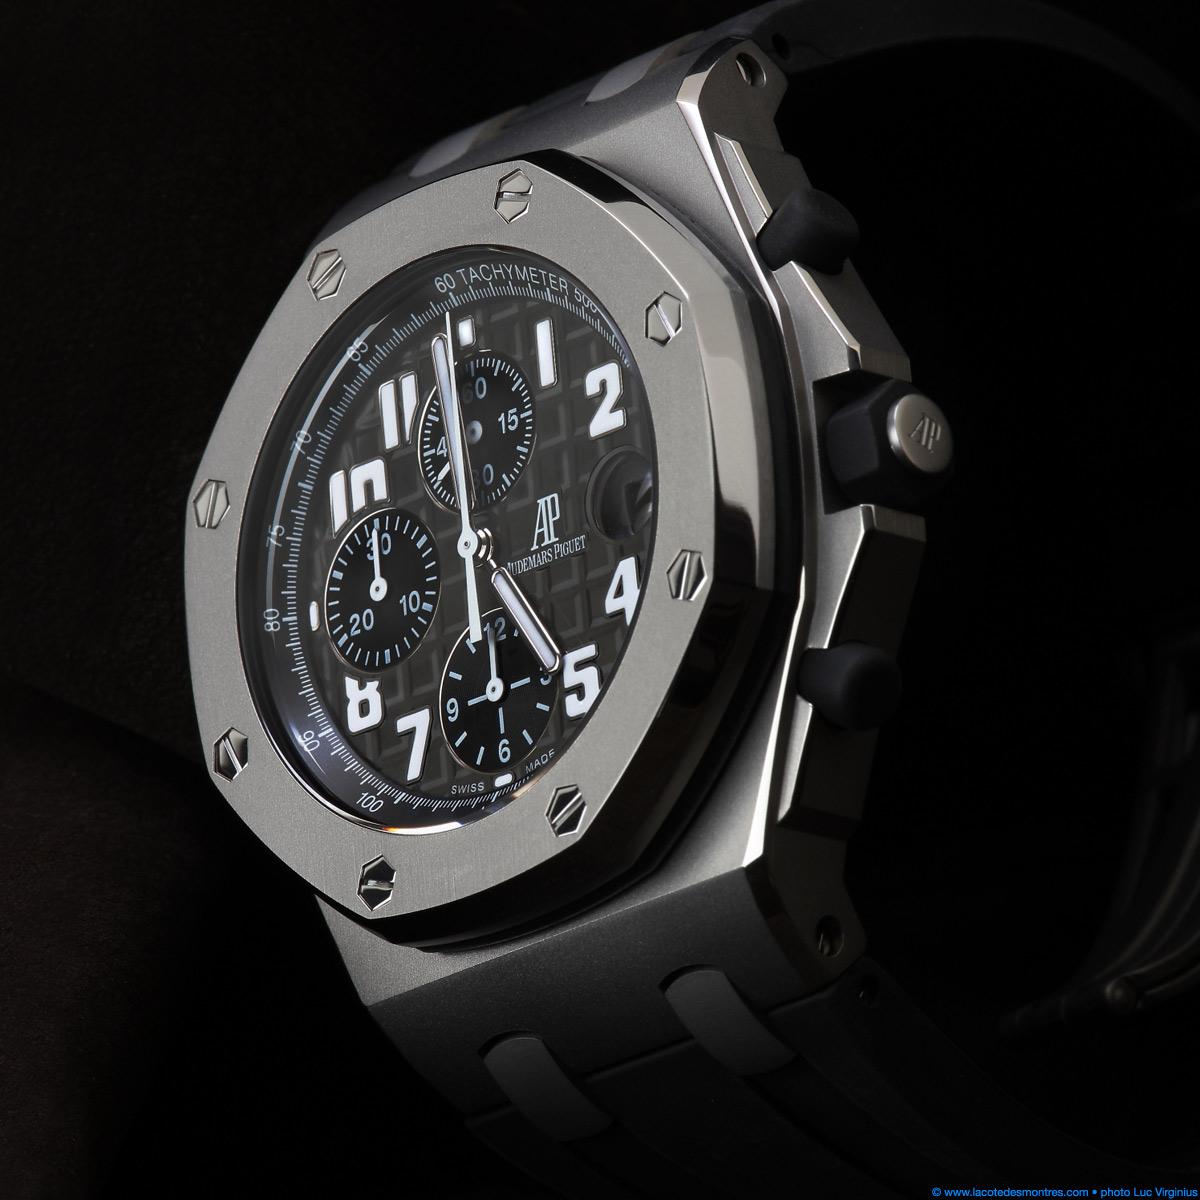 The watch quote photo audemars piguet royal oak offshore chronopassion for Royal oak offshore n7243